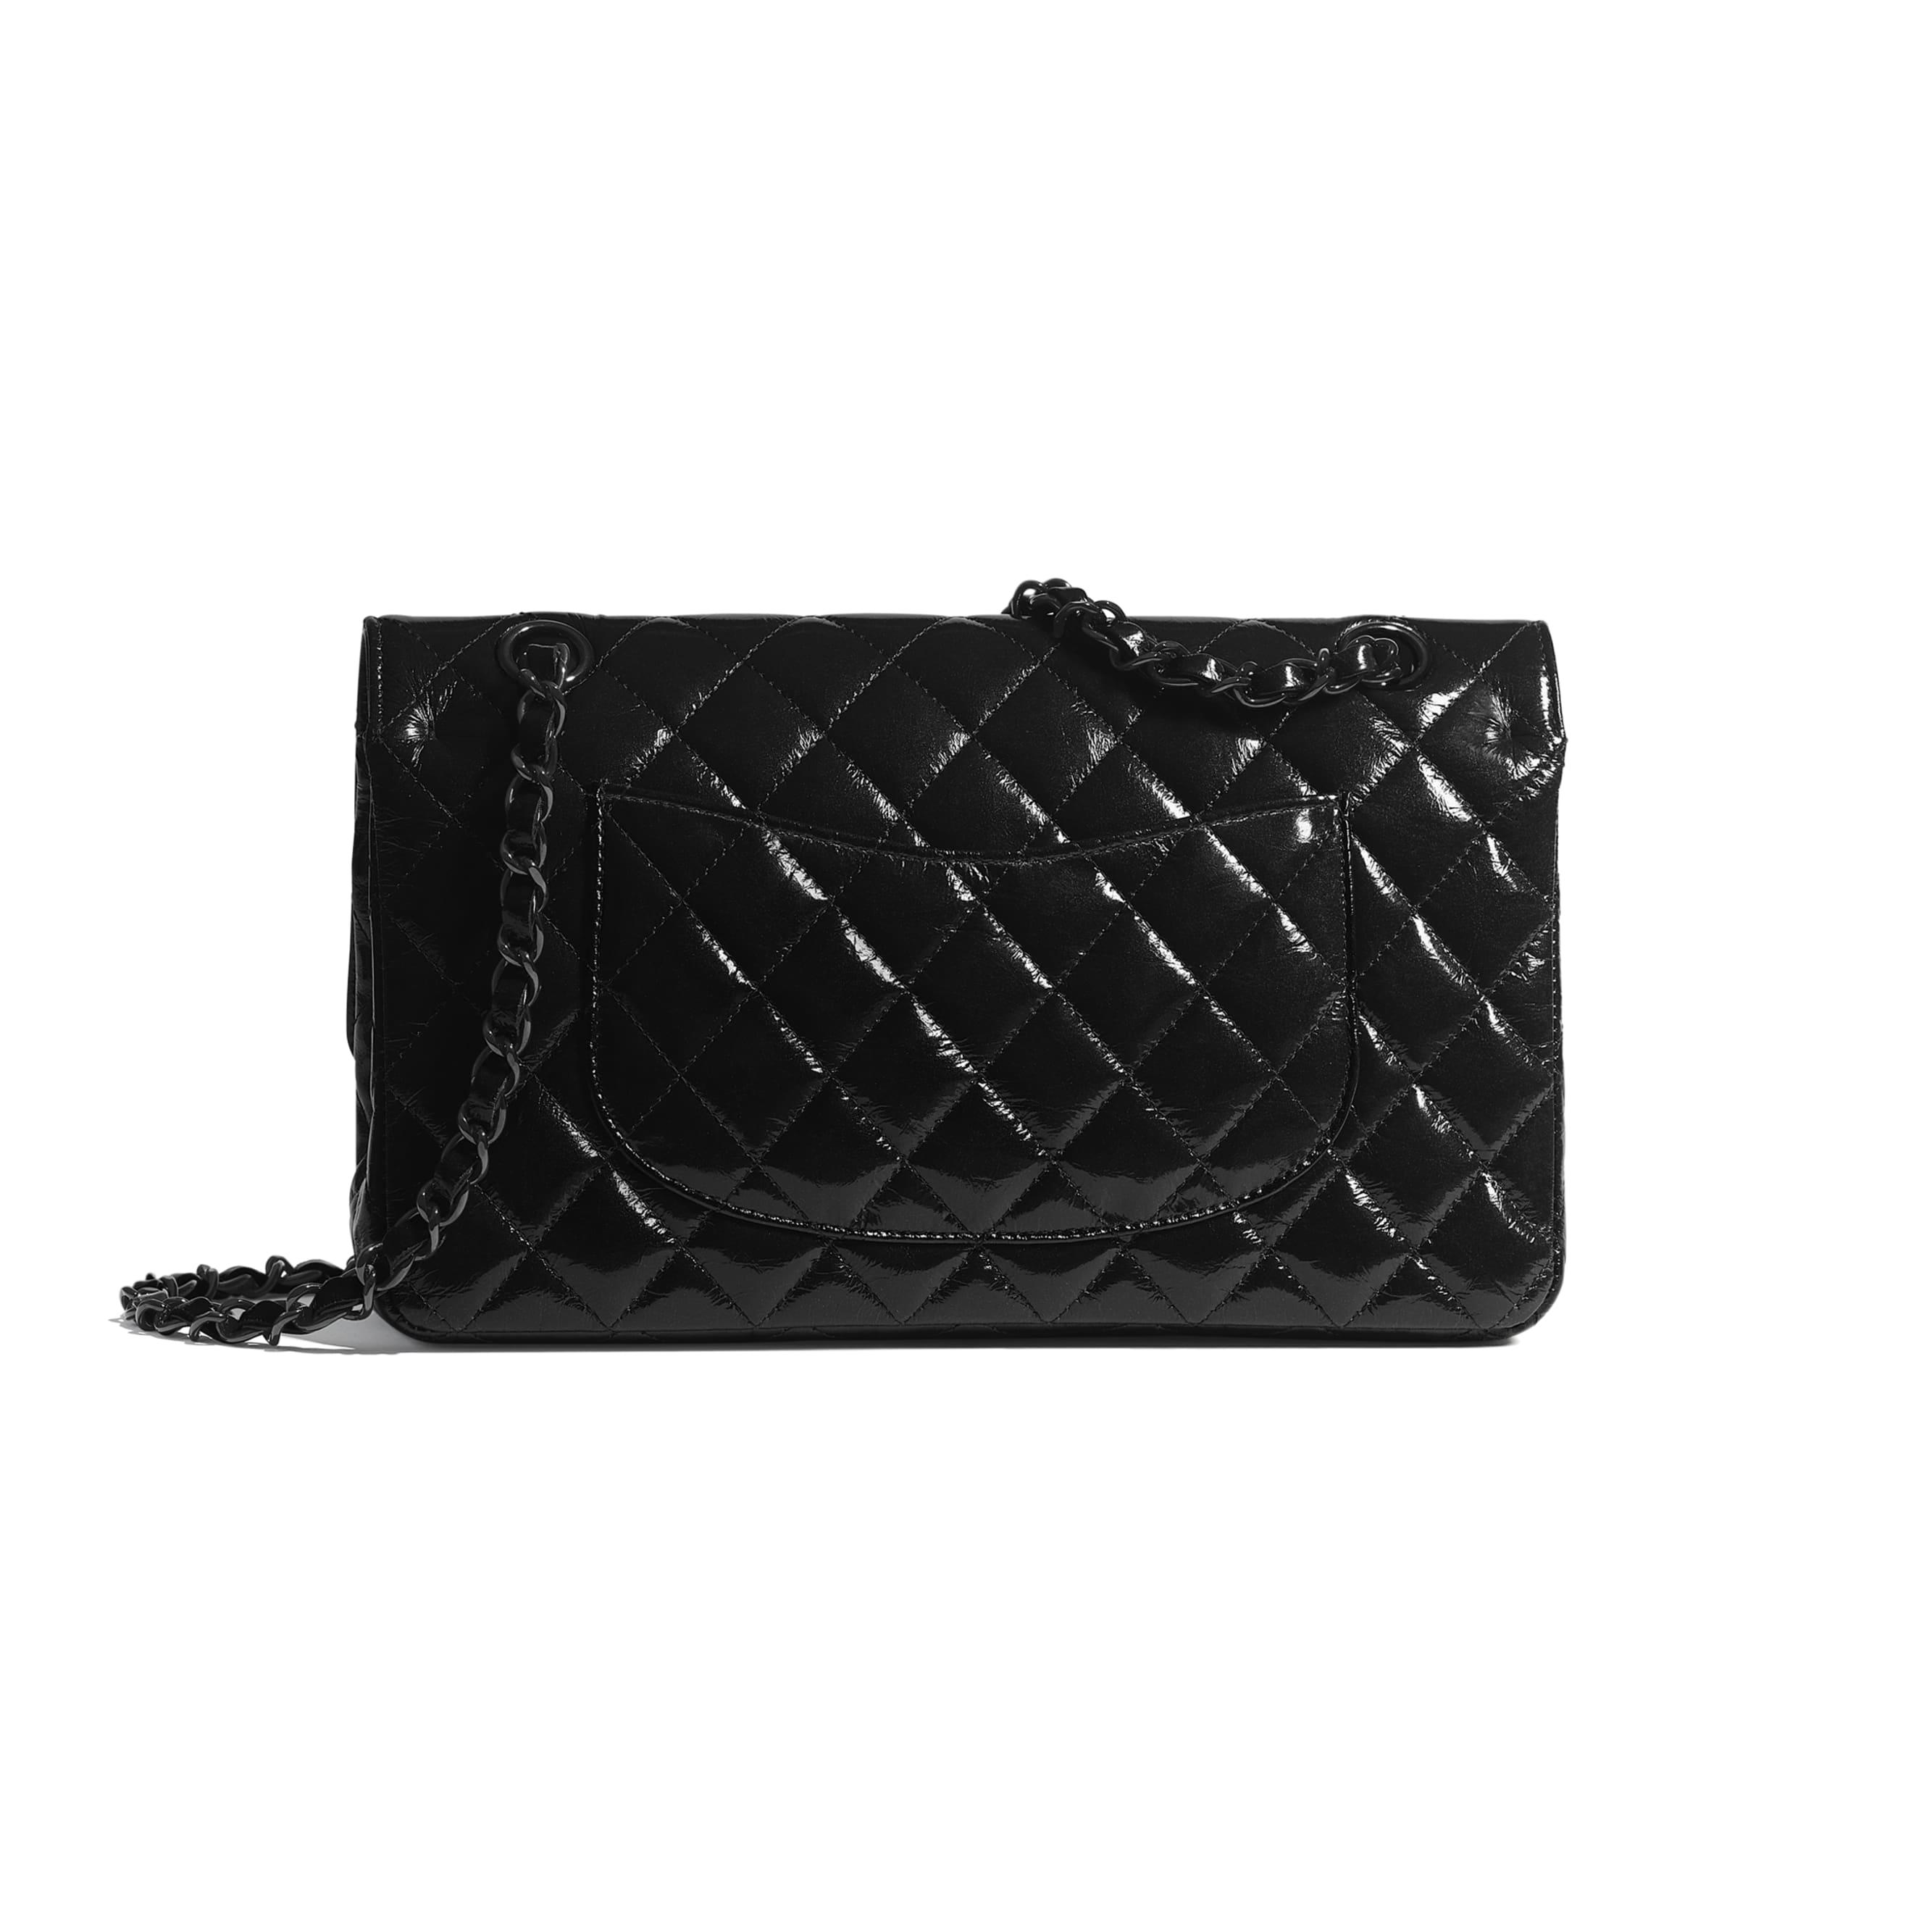 Classic Handbag - Black - Shiny Crumpled Calfksin & Black Metal - Alternative view - see standard sized version